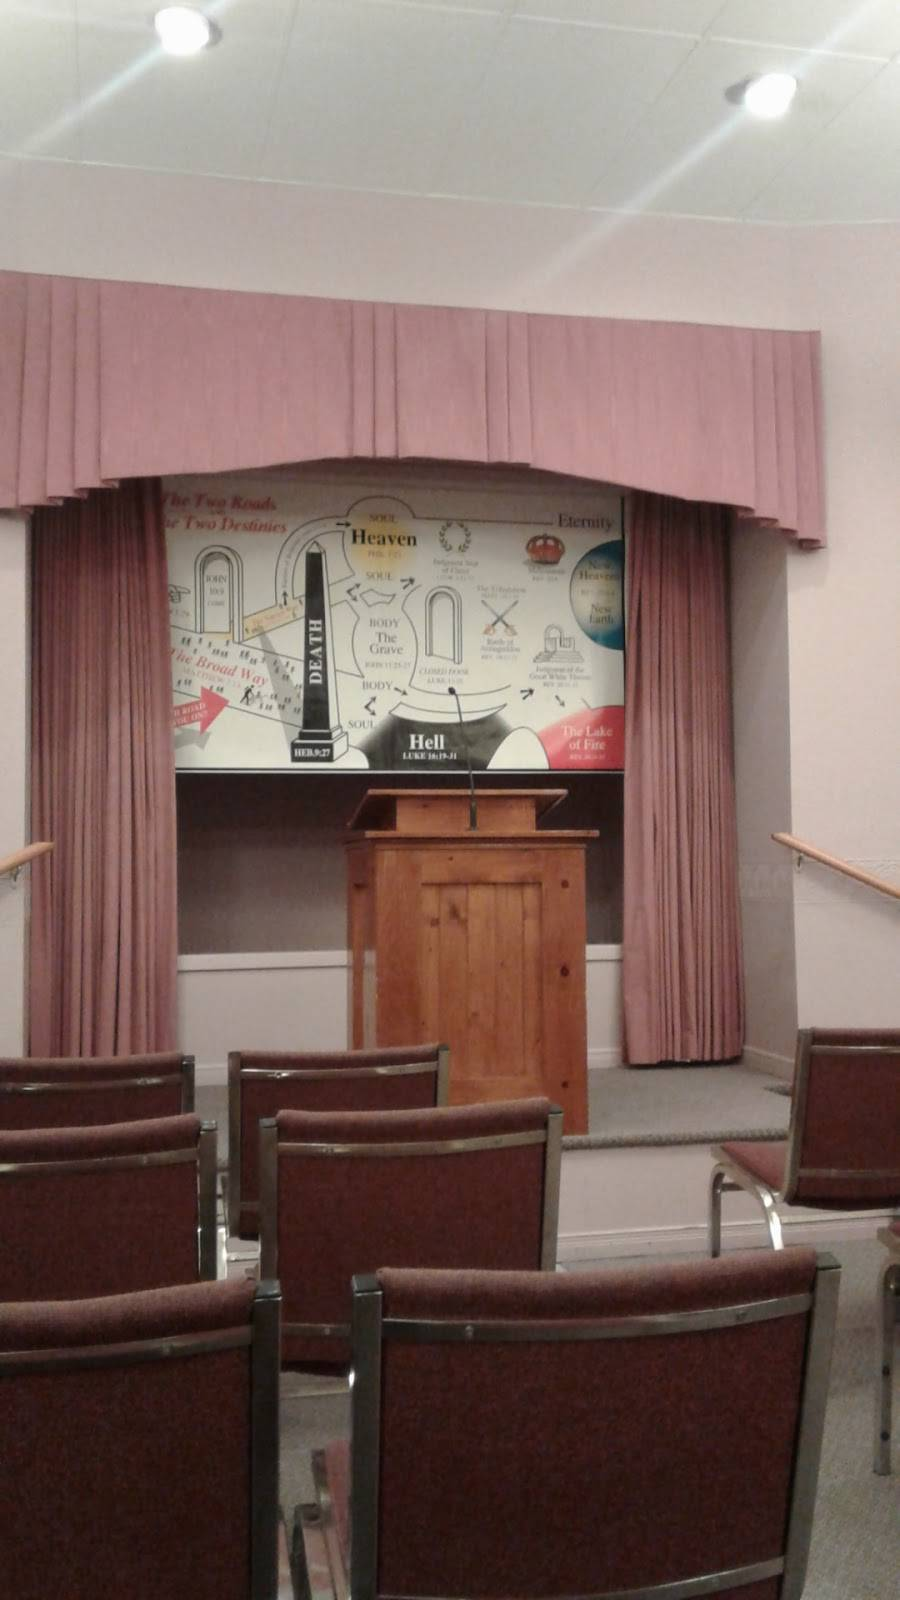 Windsor Gospel Hall - church    Photo 3 of 3   Address: 644 Partington Ave, Windsor, ON N9B 2N7, Canada   Phone: (519) 966-0365